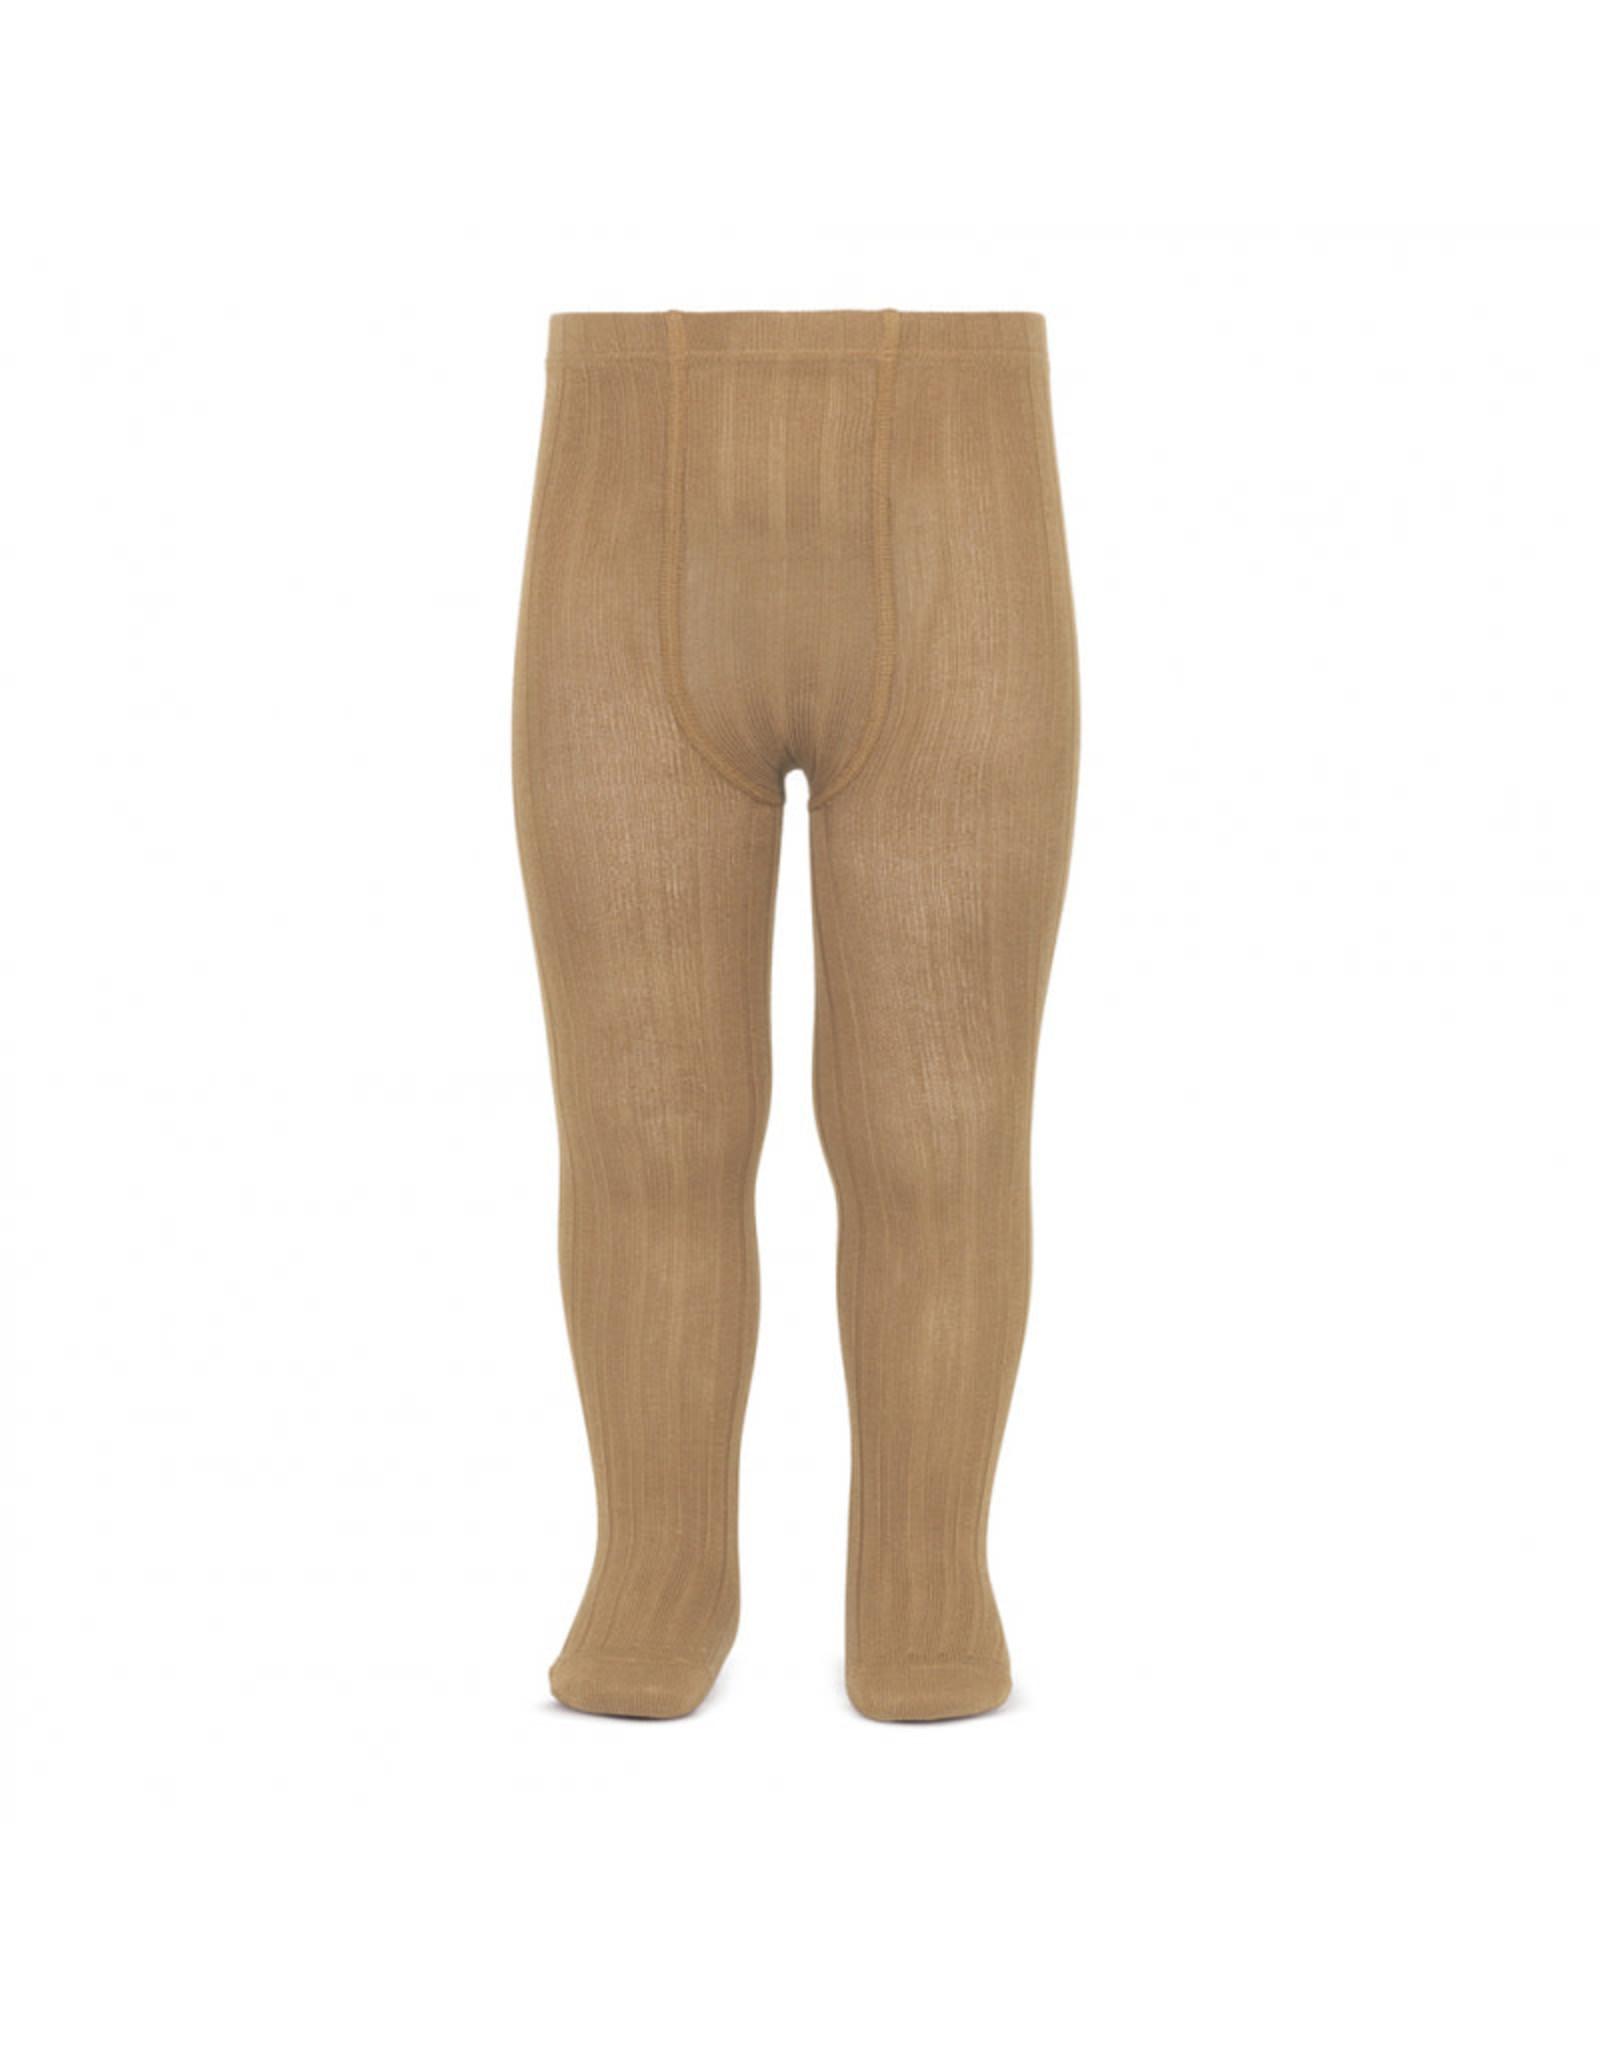 CONDOR Camel Ribbed Tights